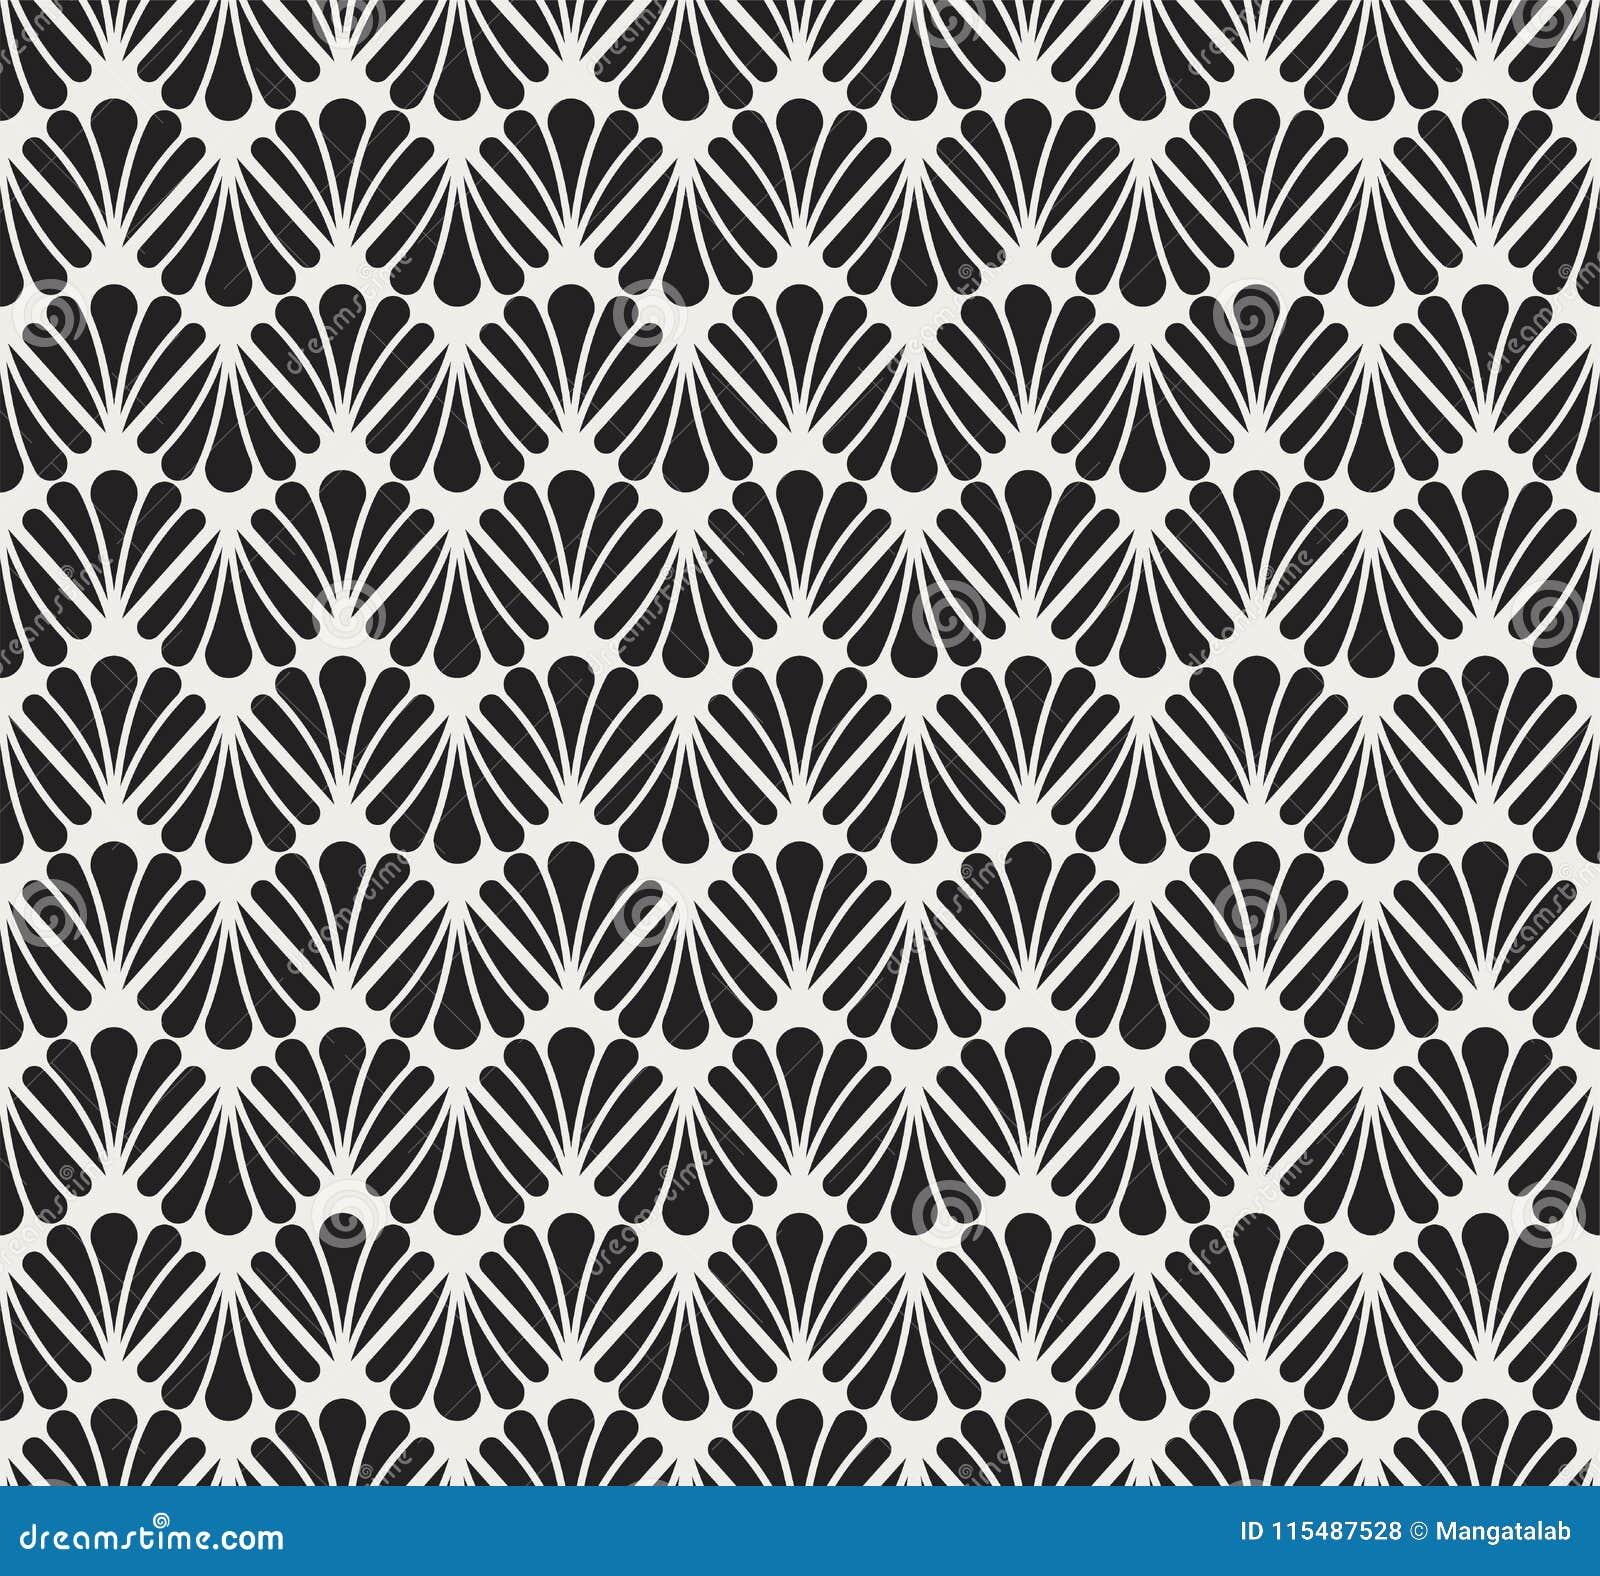 Vector Floral Art Nouveau Seamless Pattern Geometric Decorative